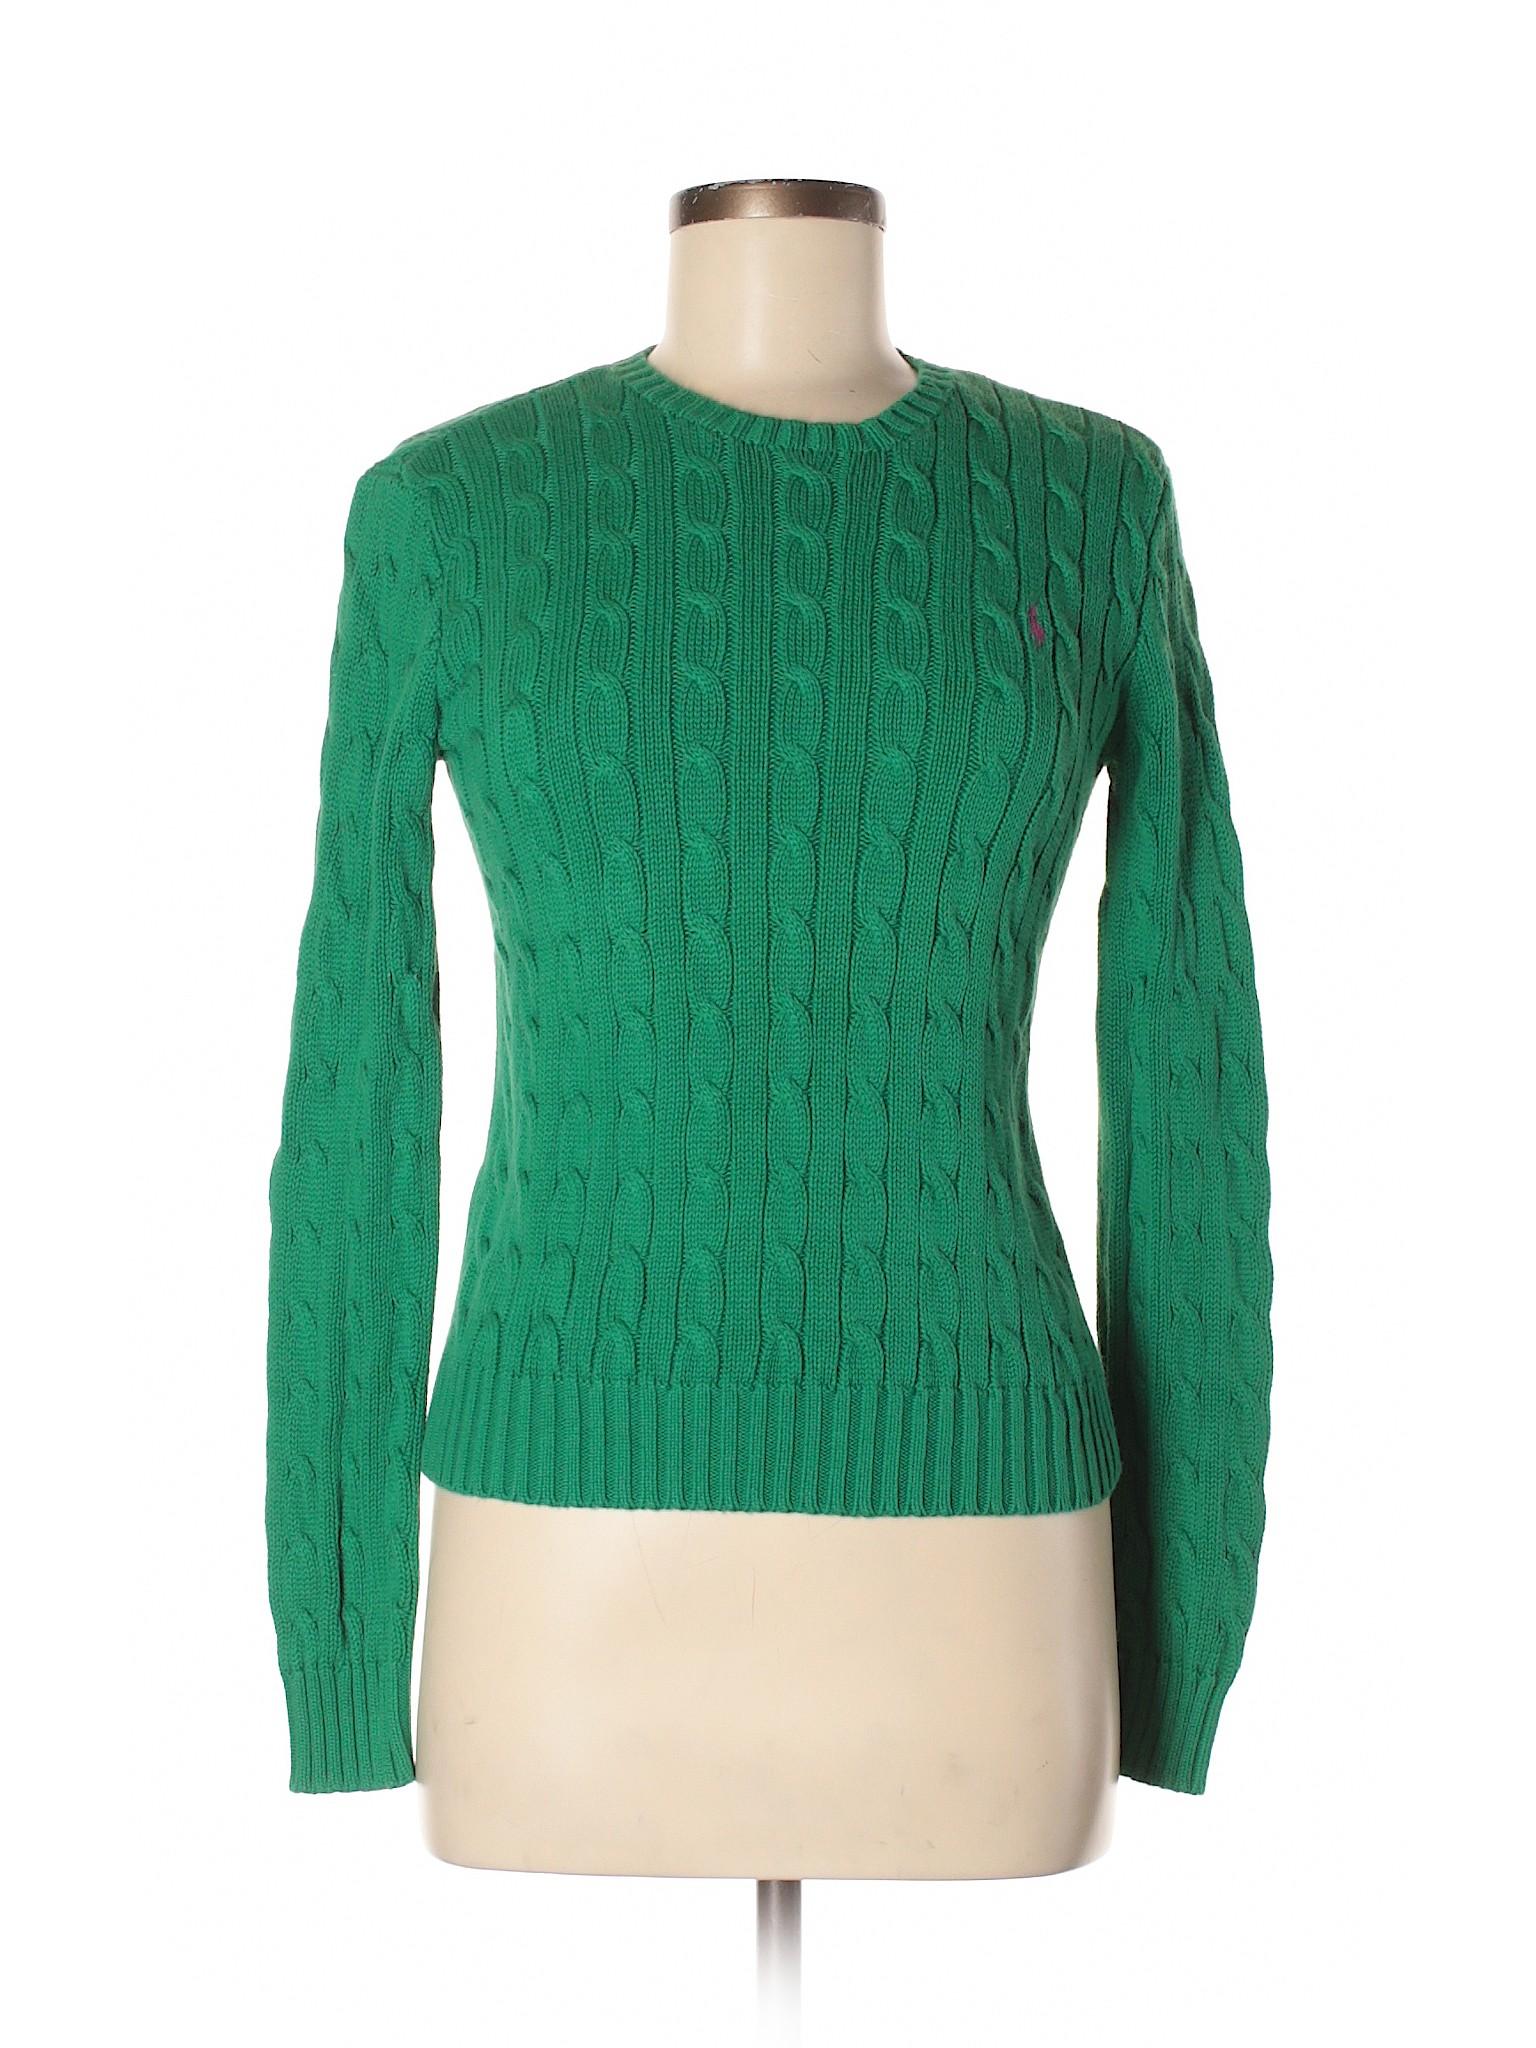 Pullover Ralph Boutique Lauren Lauren Ralph Lauren Boutique Sweater Pullover Sweater Boutique Ralph RYxX5w